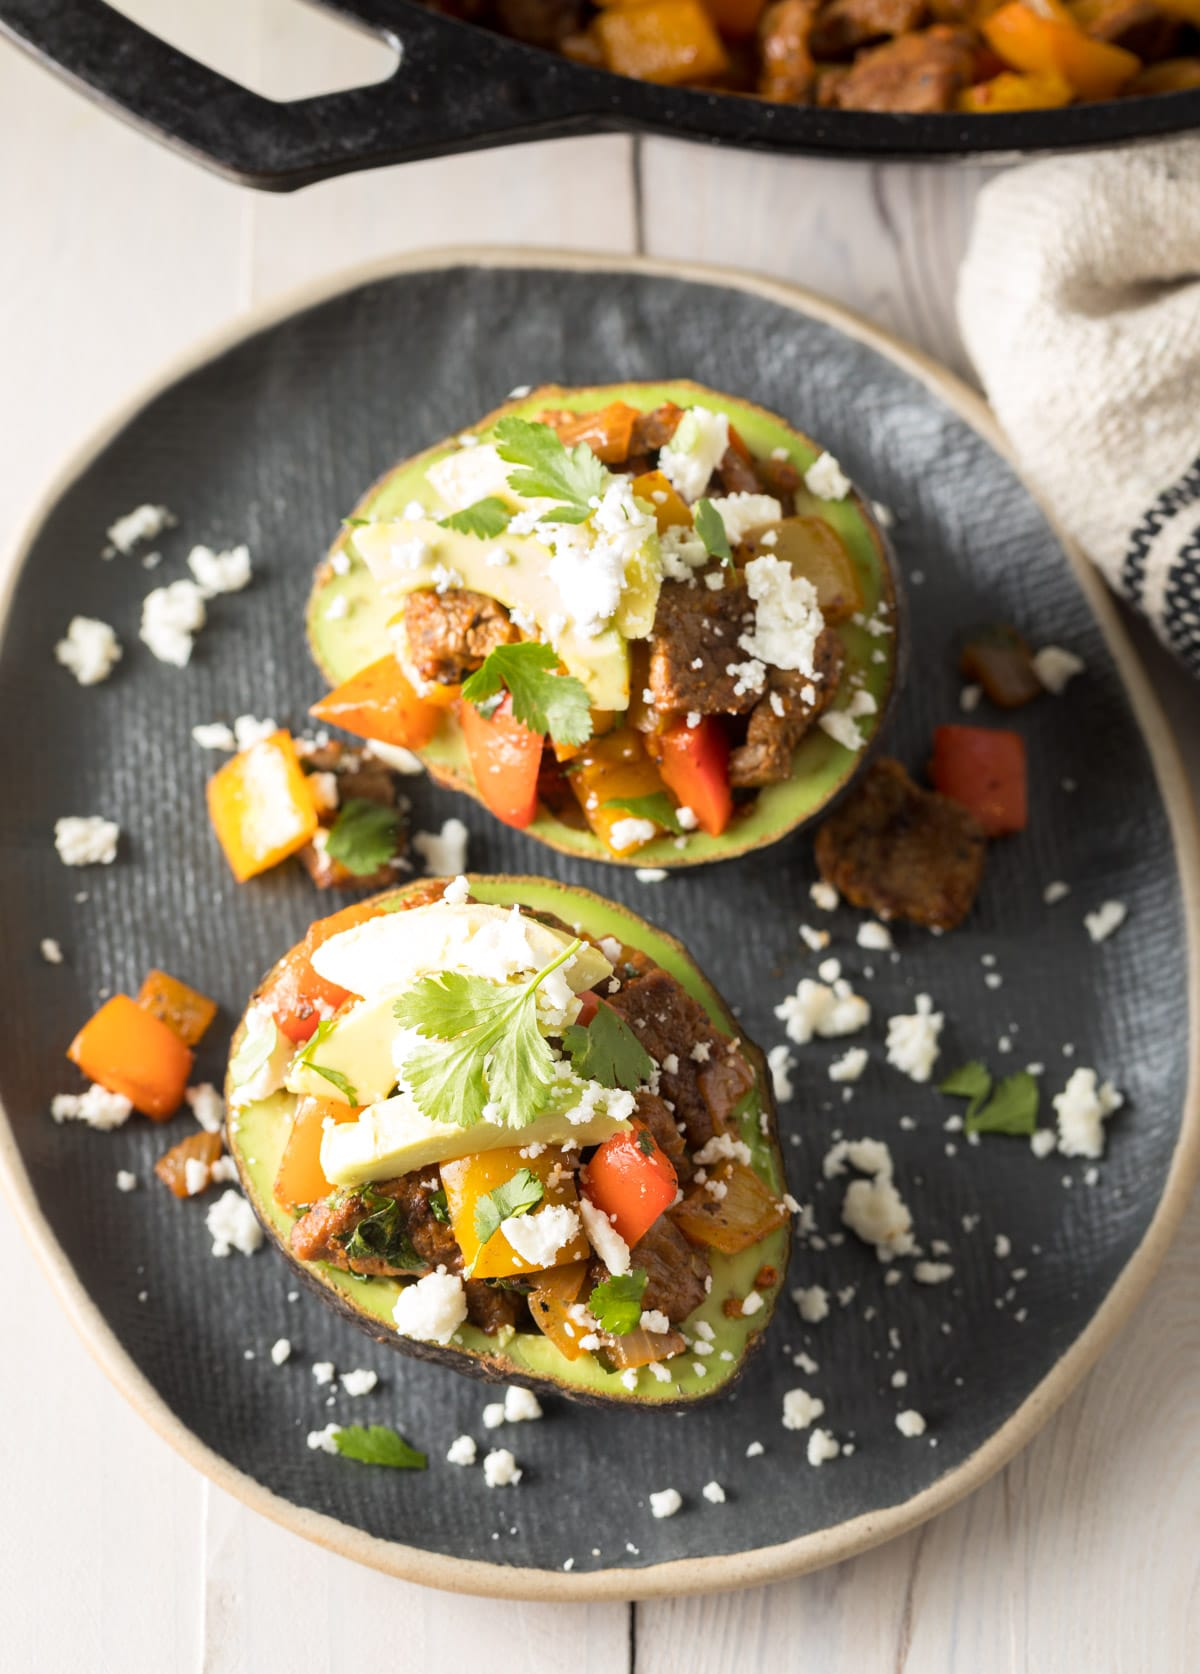 Steak Fajita Stuffed Avocado Recipe #ASpicyPerspective #lowcarb #keto #paleo